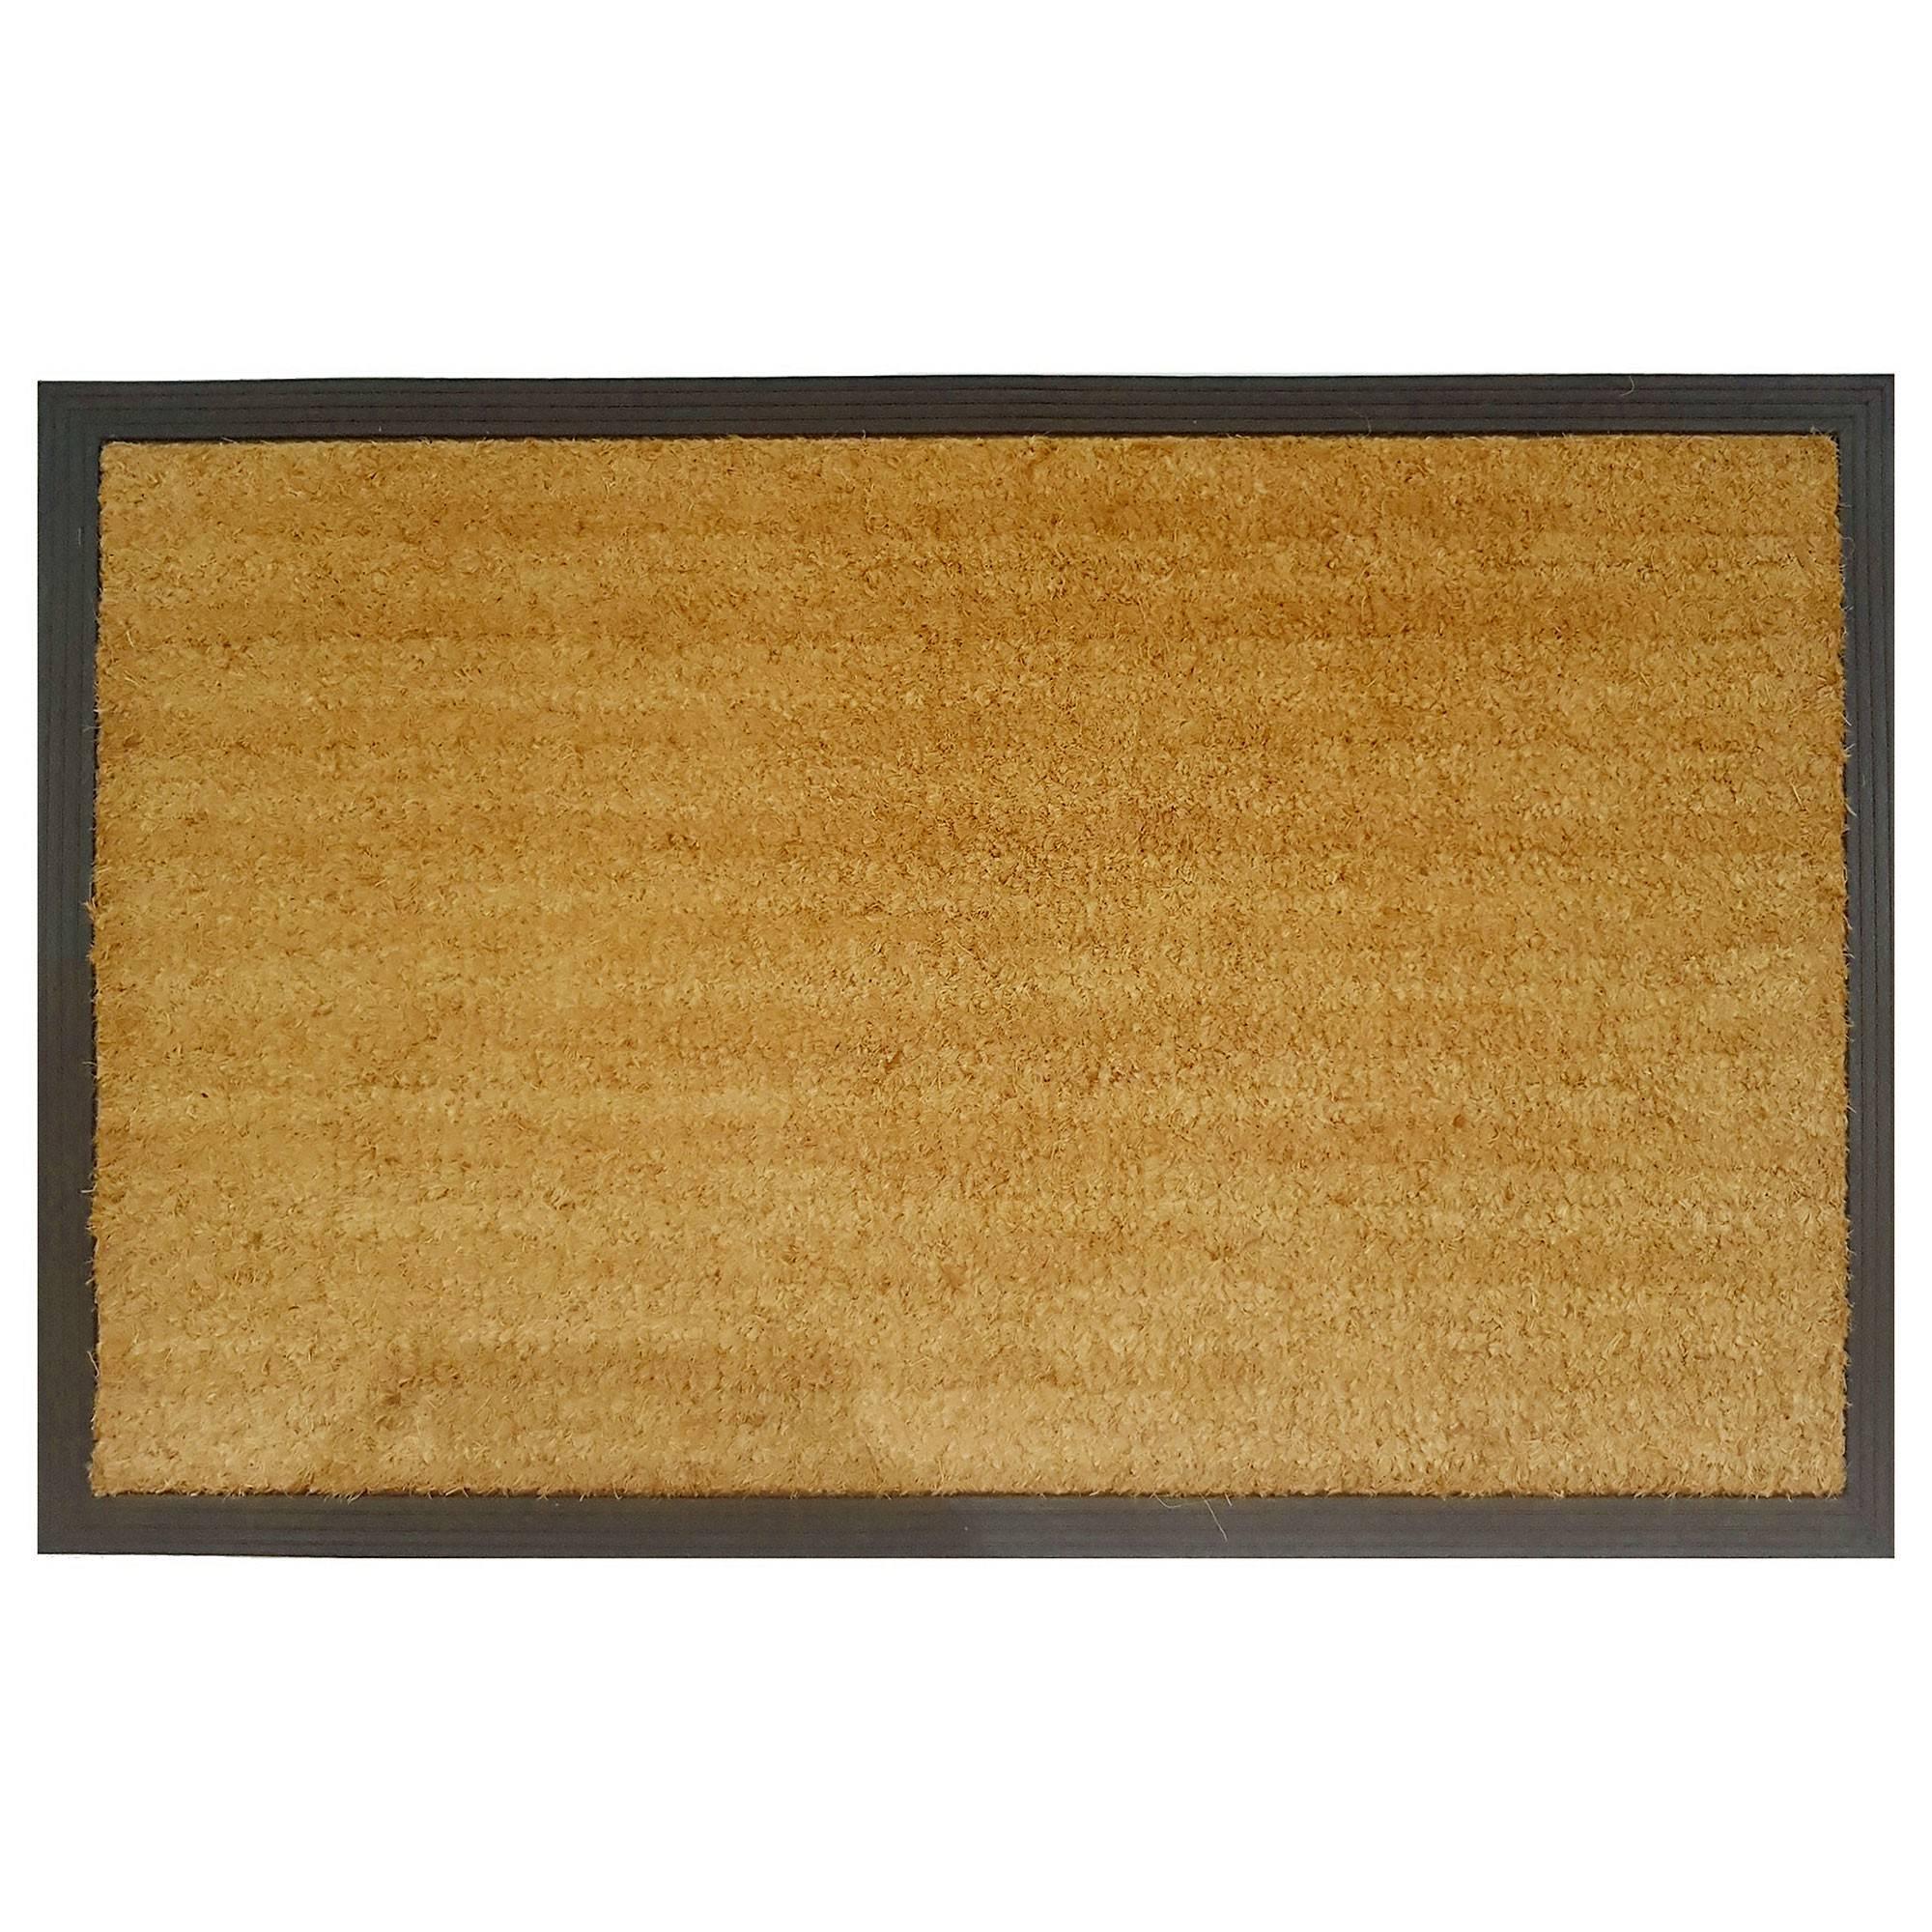 Barber Rubber Edged Coir Doormat, 95x60cm